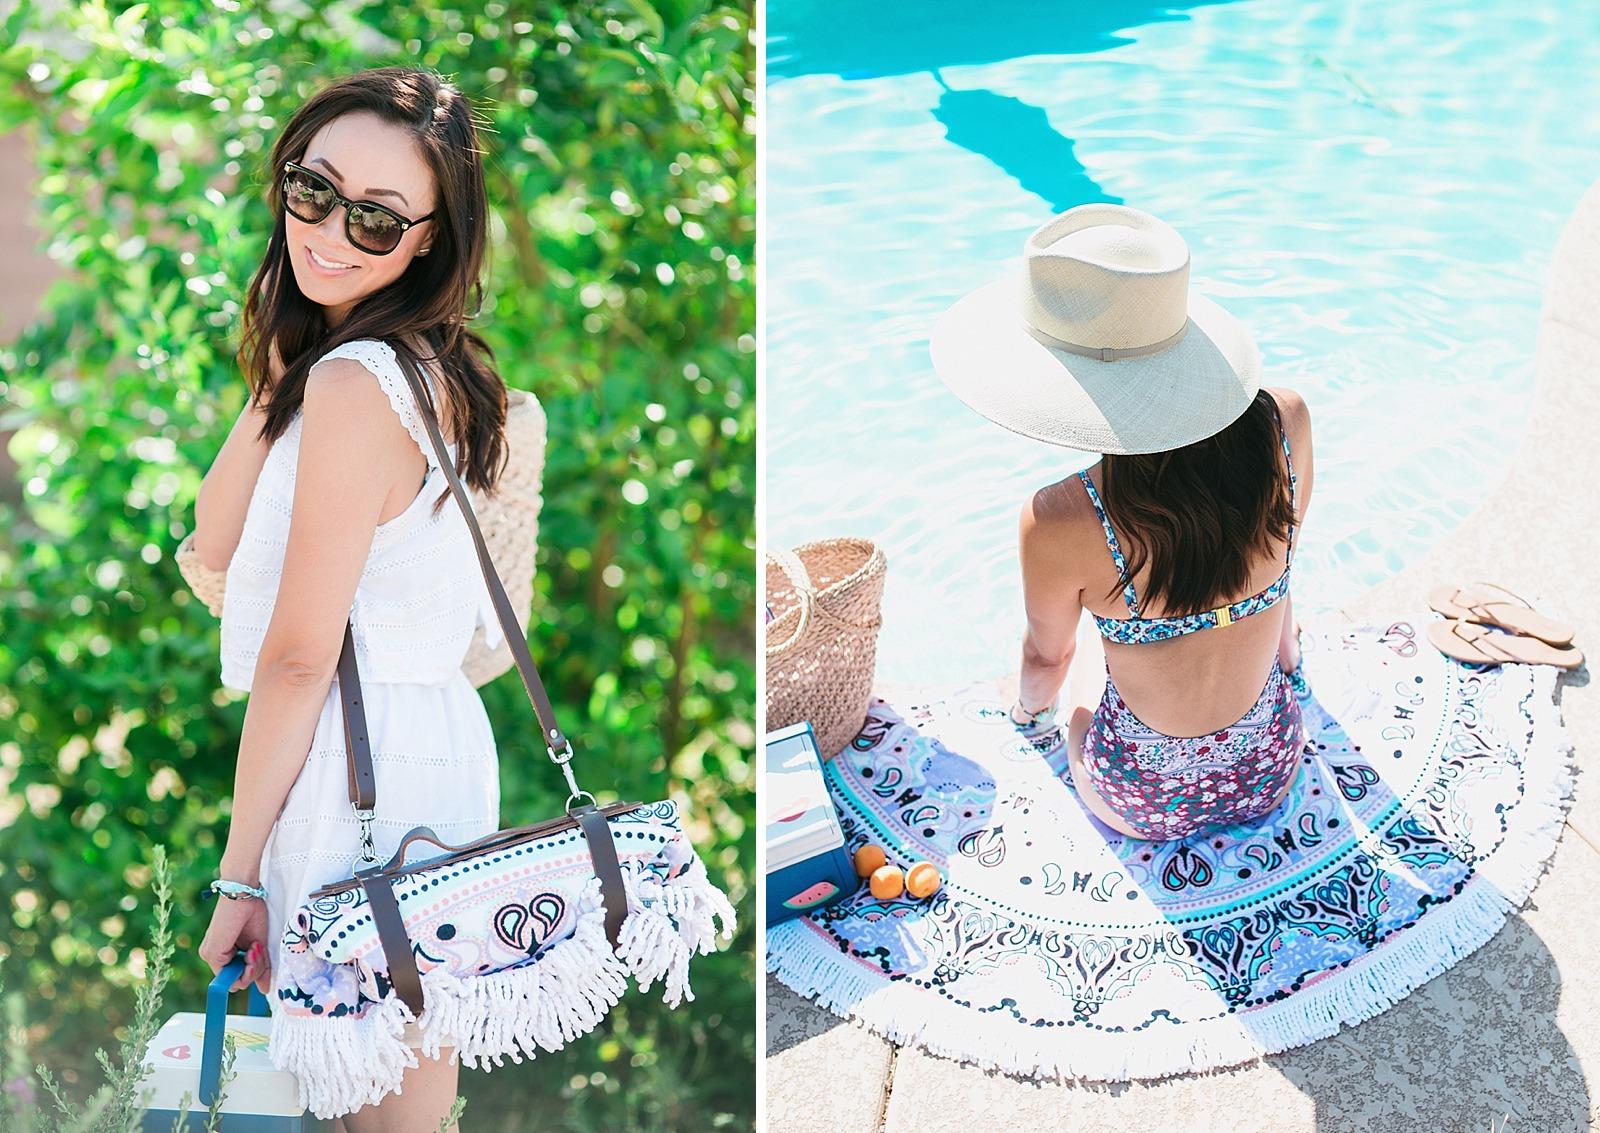 weight-watchers-pool-ready-summer-photoshoot-pool-shoot-model-lifestyle-blogger-arizona-phoenix-diana-elizabeth-blog-_0047